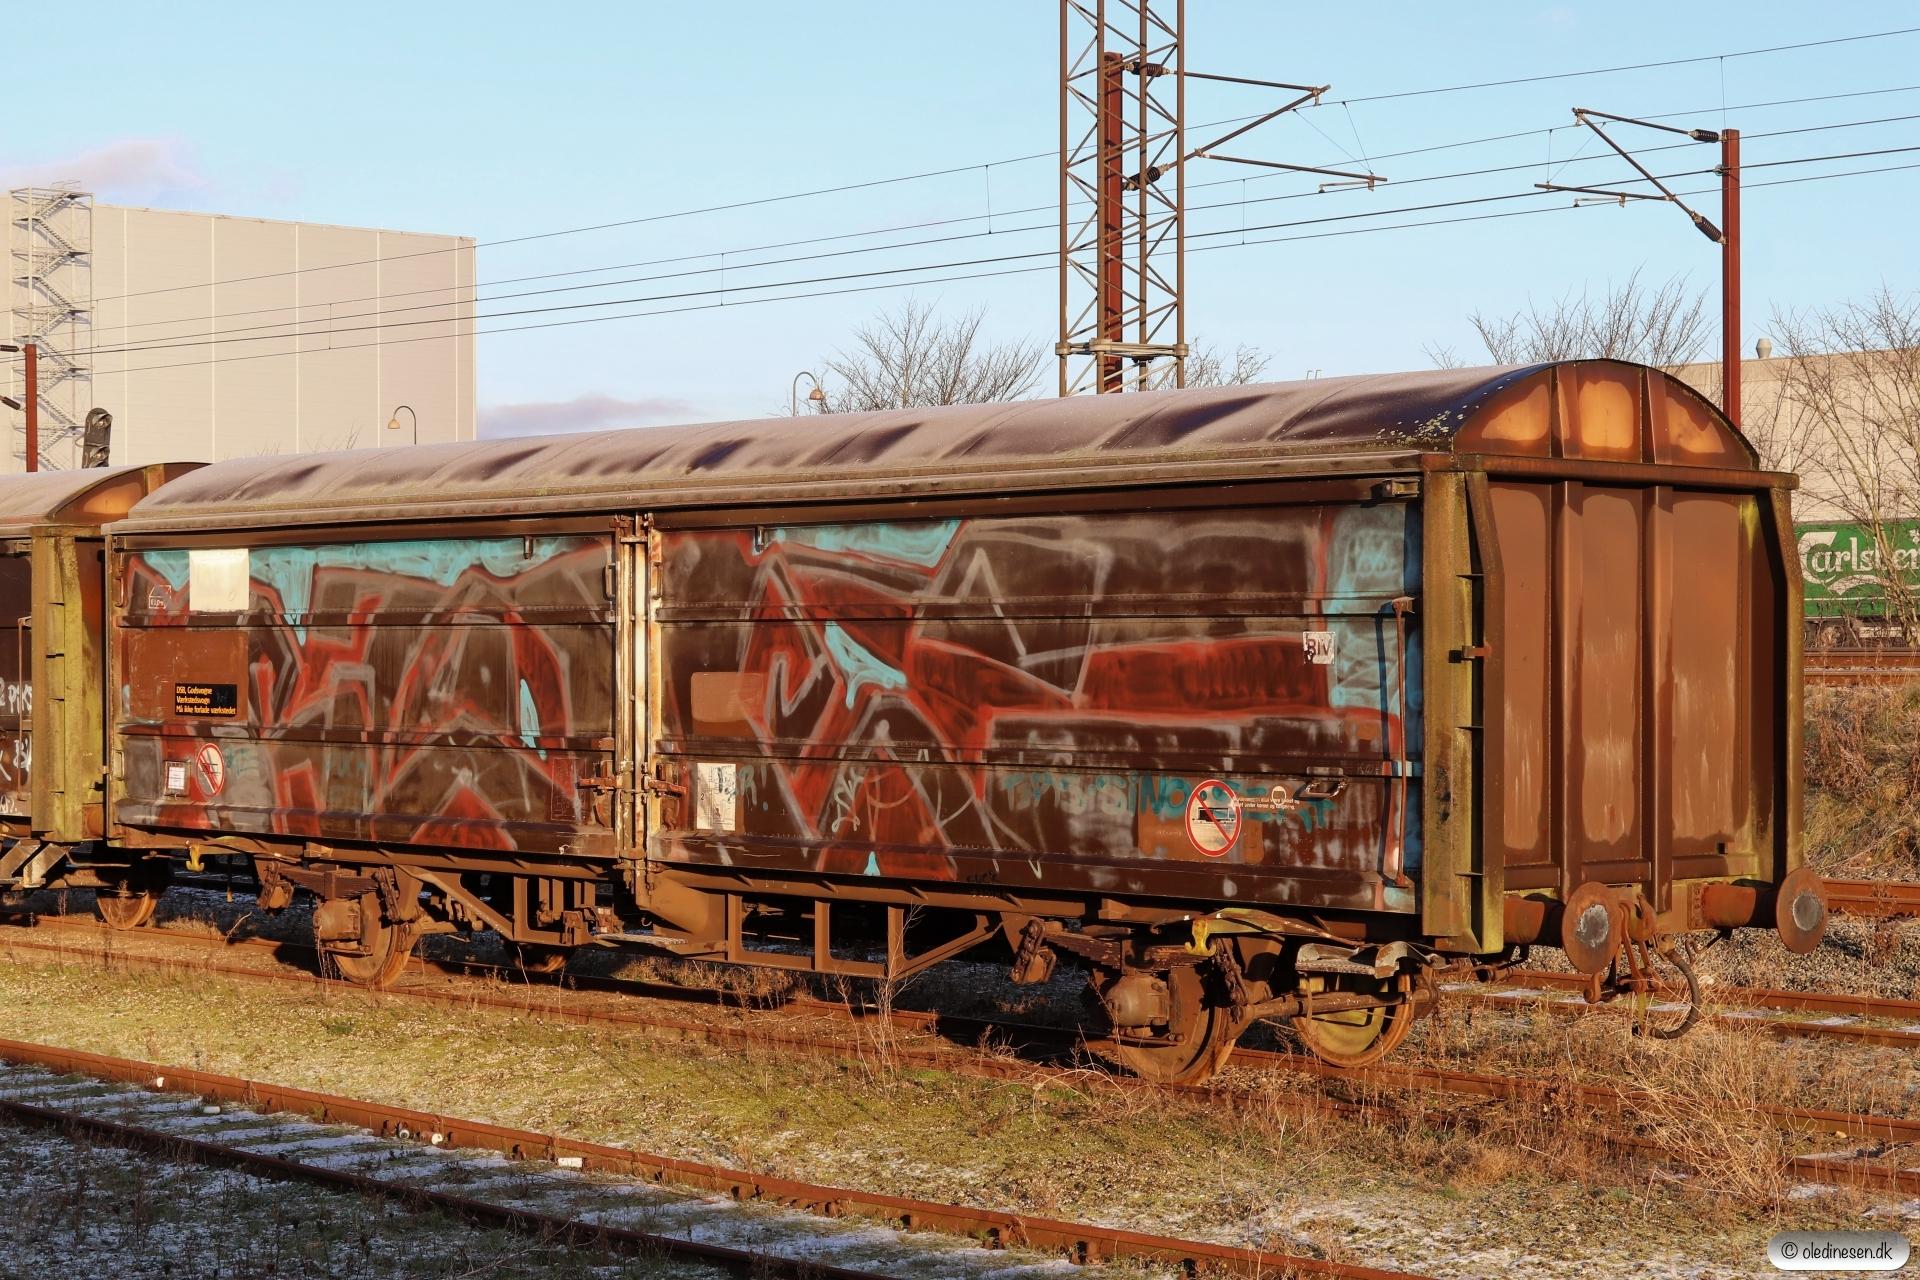 DSB Hbis-x 42 86 225 5 104-5. Fredericia 16.01.2021.